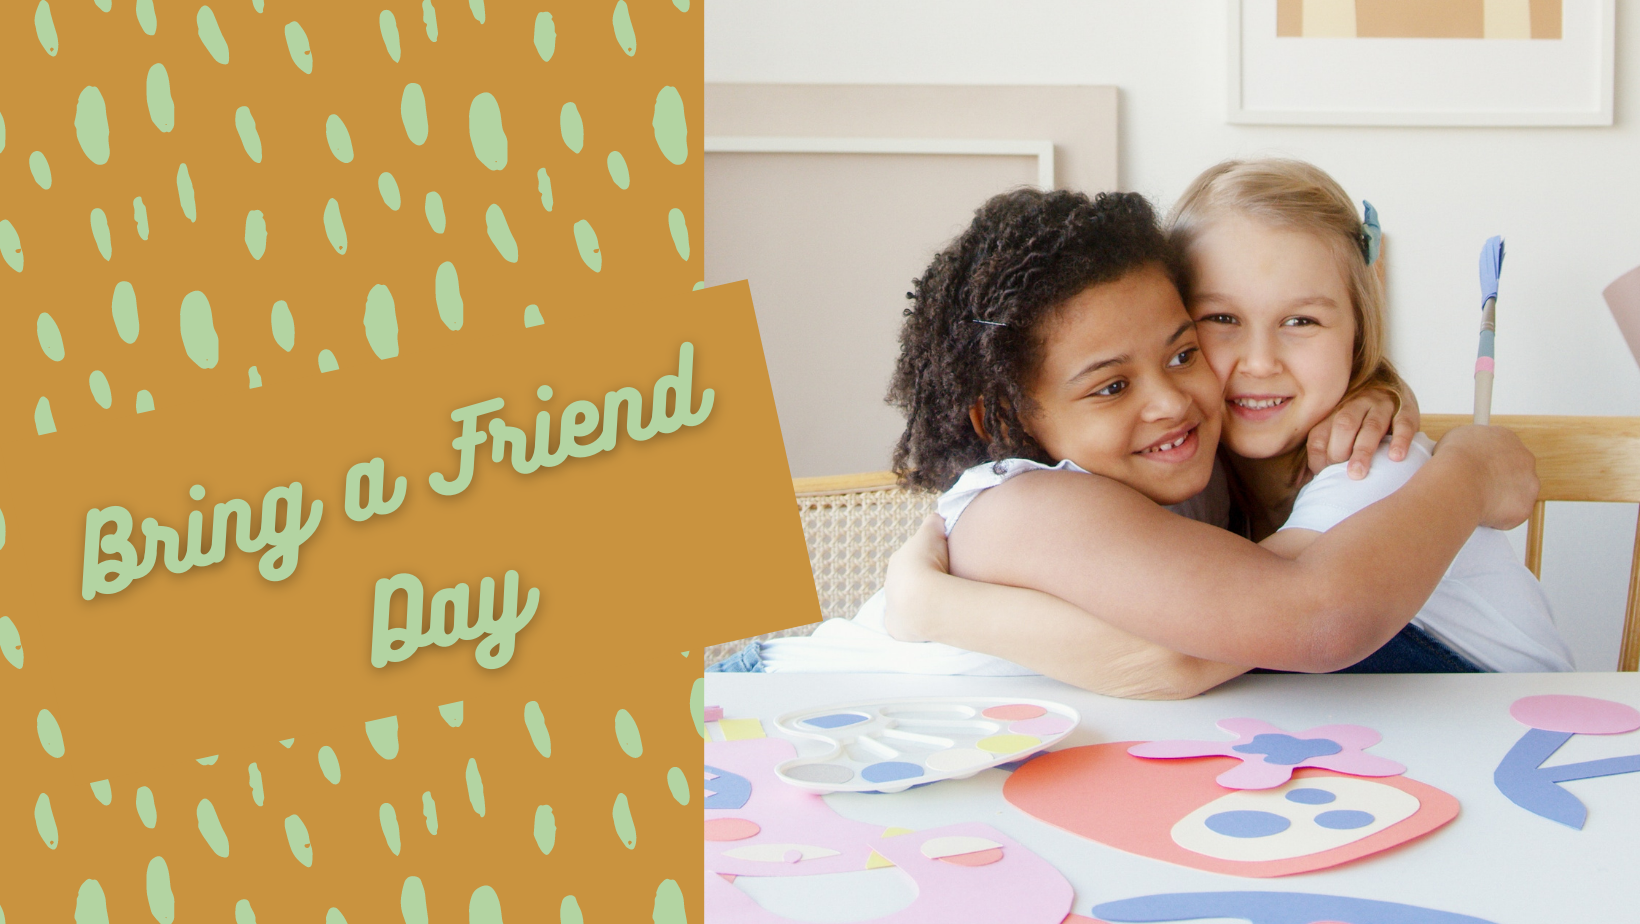 Bring a Friend Day - August 22, 2021!